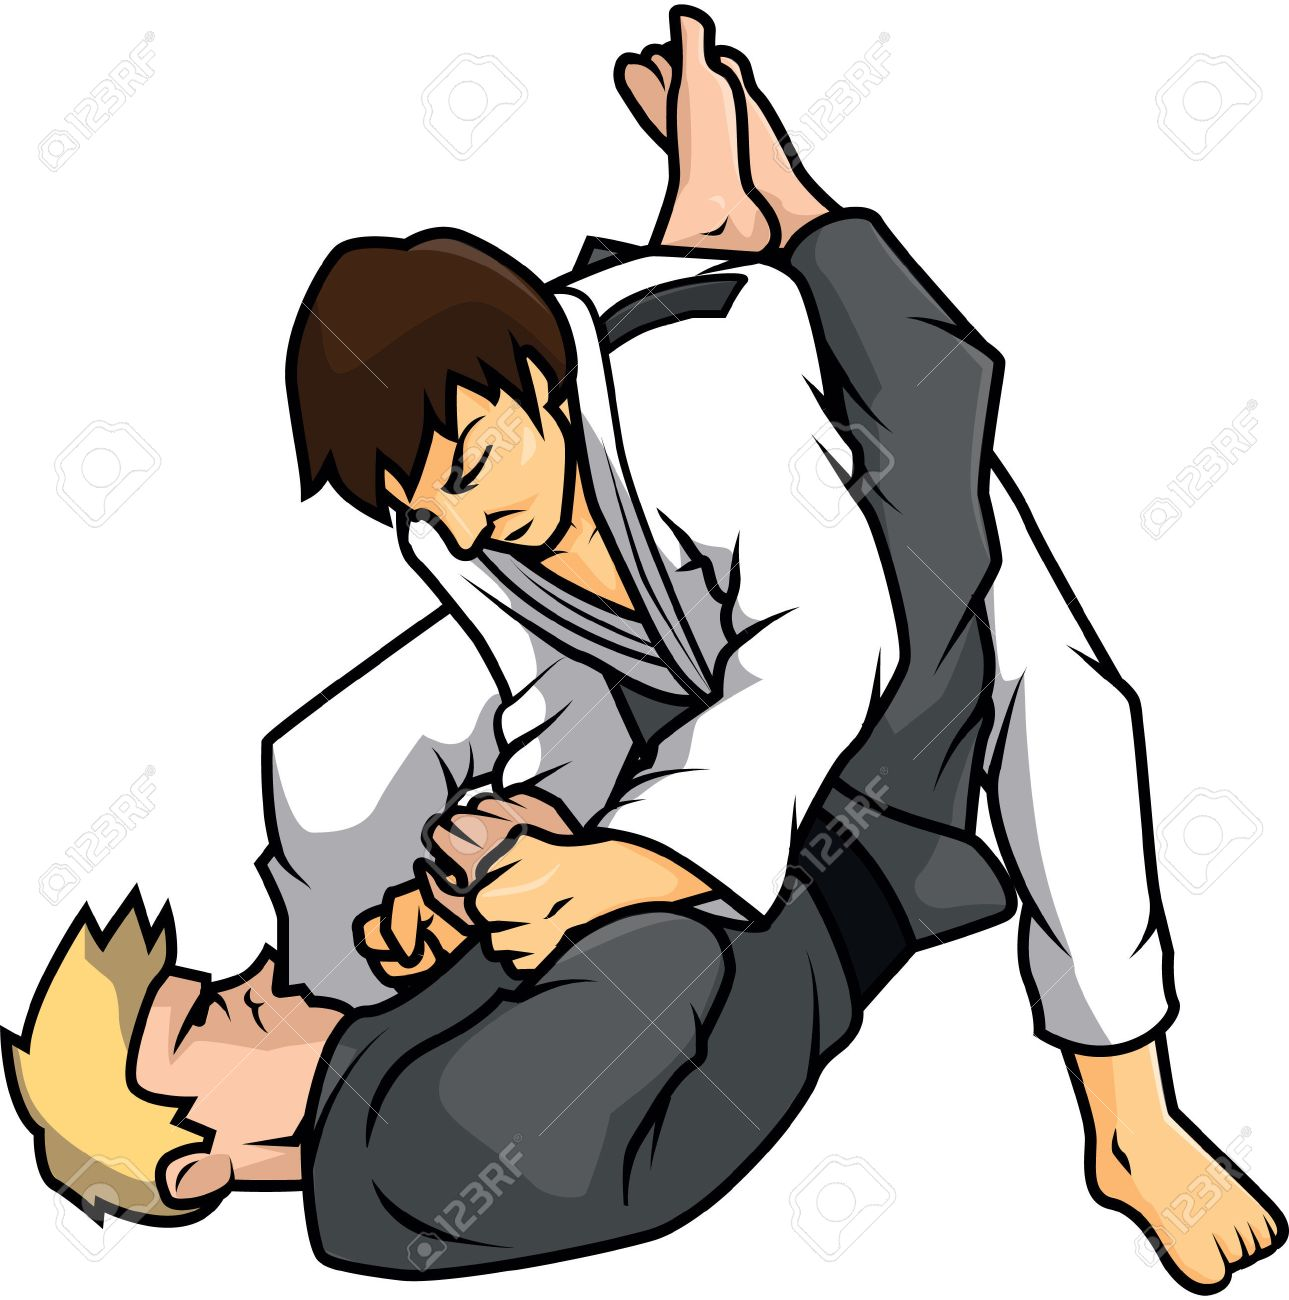 jiu jitsu training illustration design - 48549938